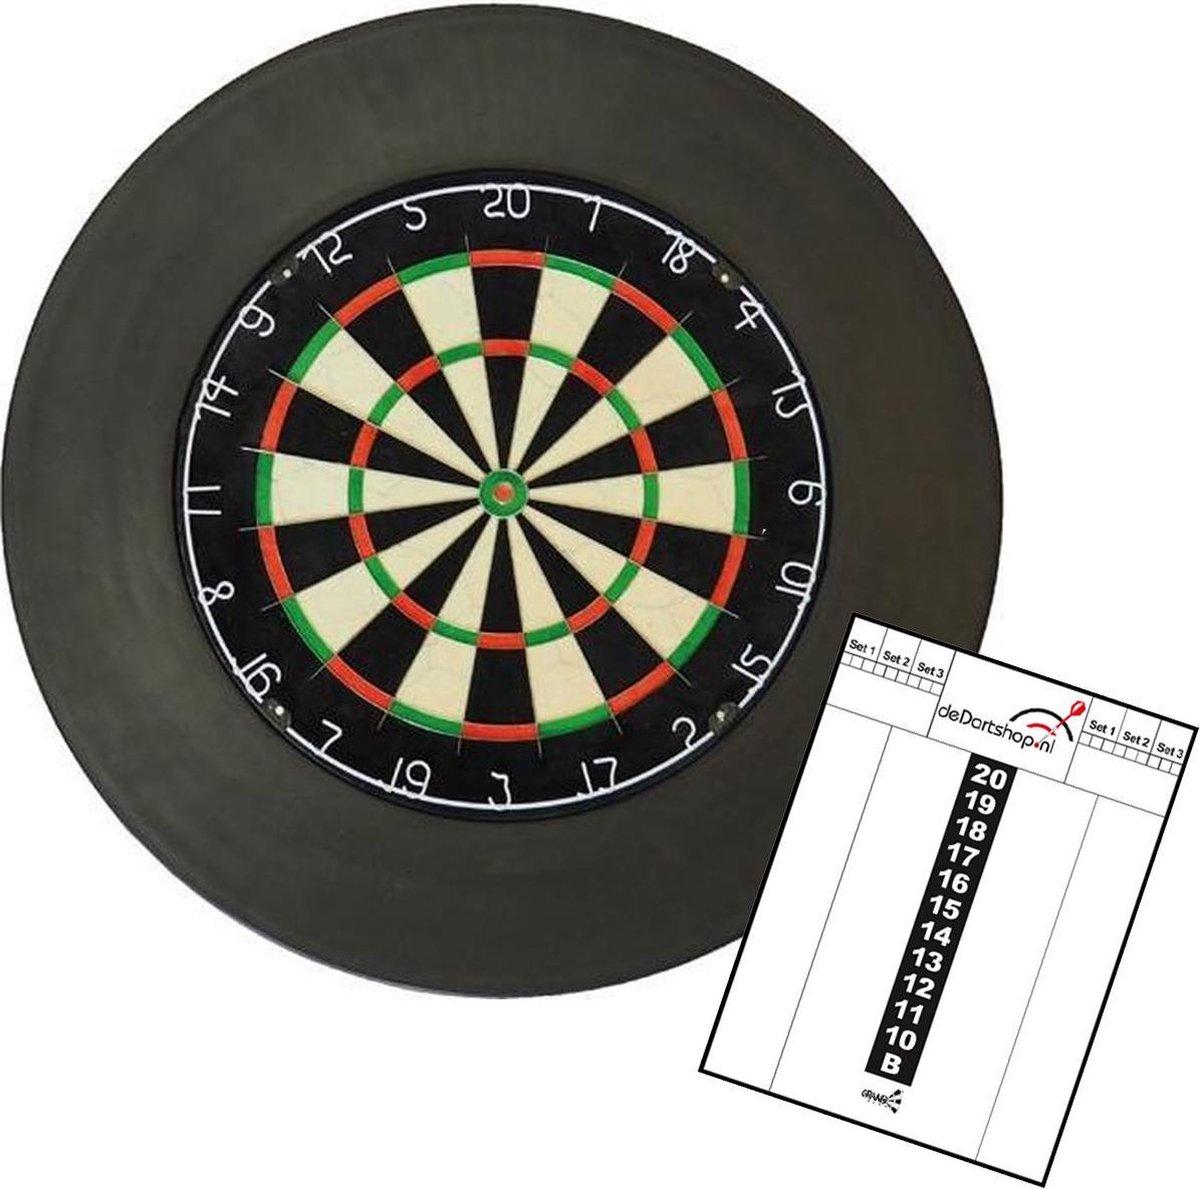 A-merk dartbord met zwarte surround en scorebord